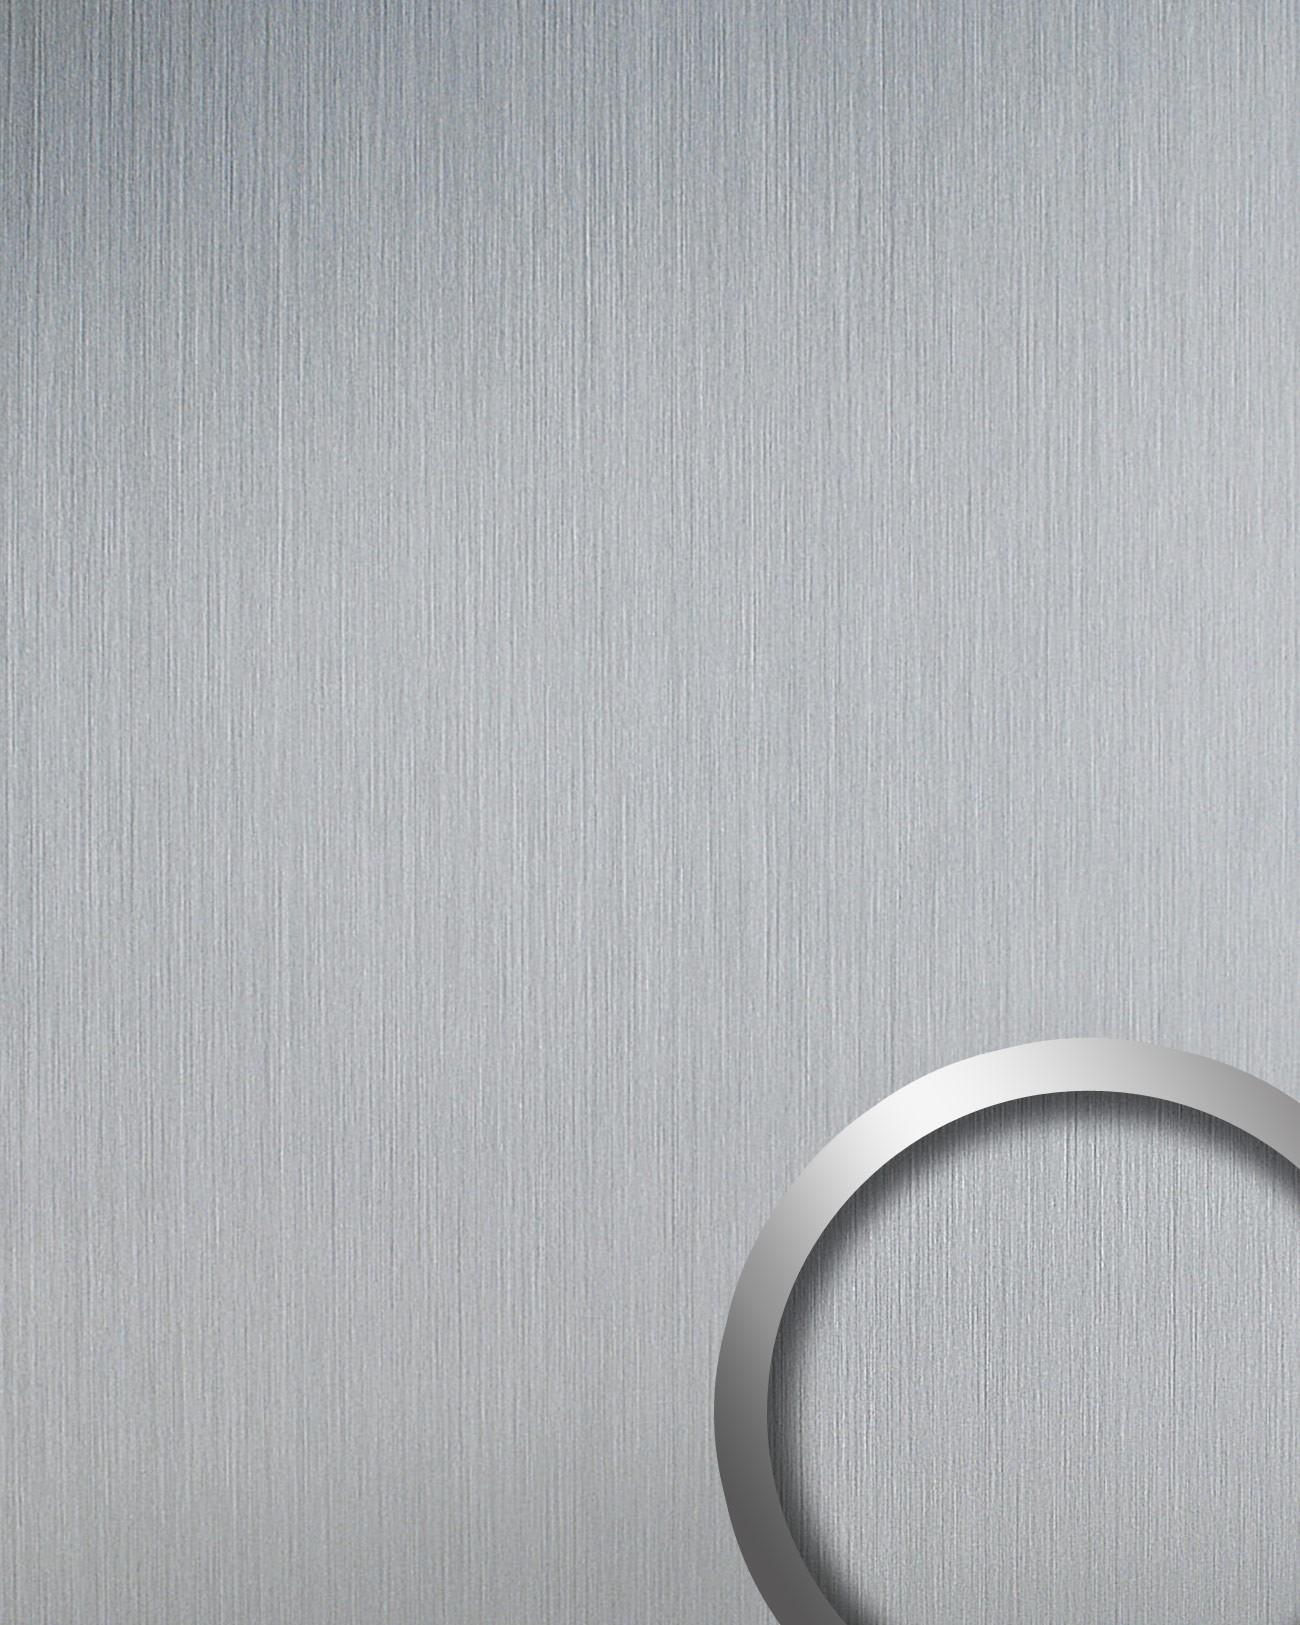 Selbstklebende Design Tapete : Design Platte WallFace 14409 DECO EyeCatch Metall Dekor selbstklebende